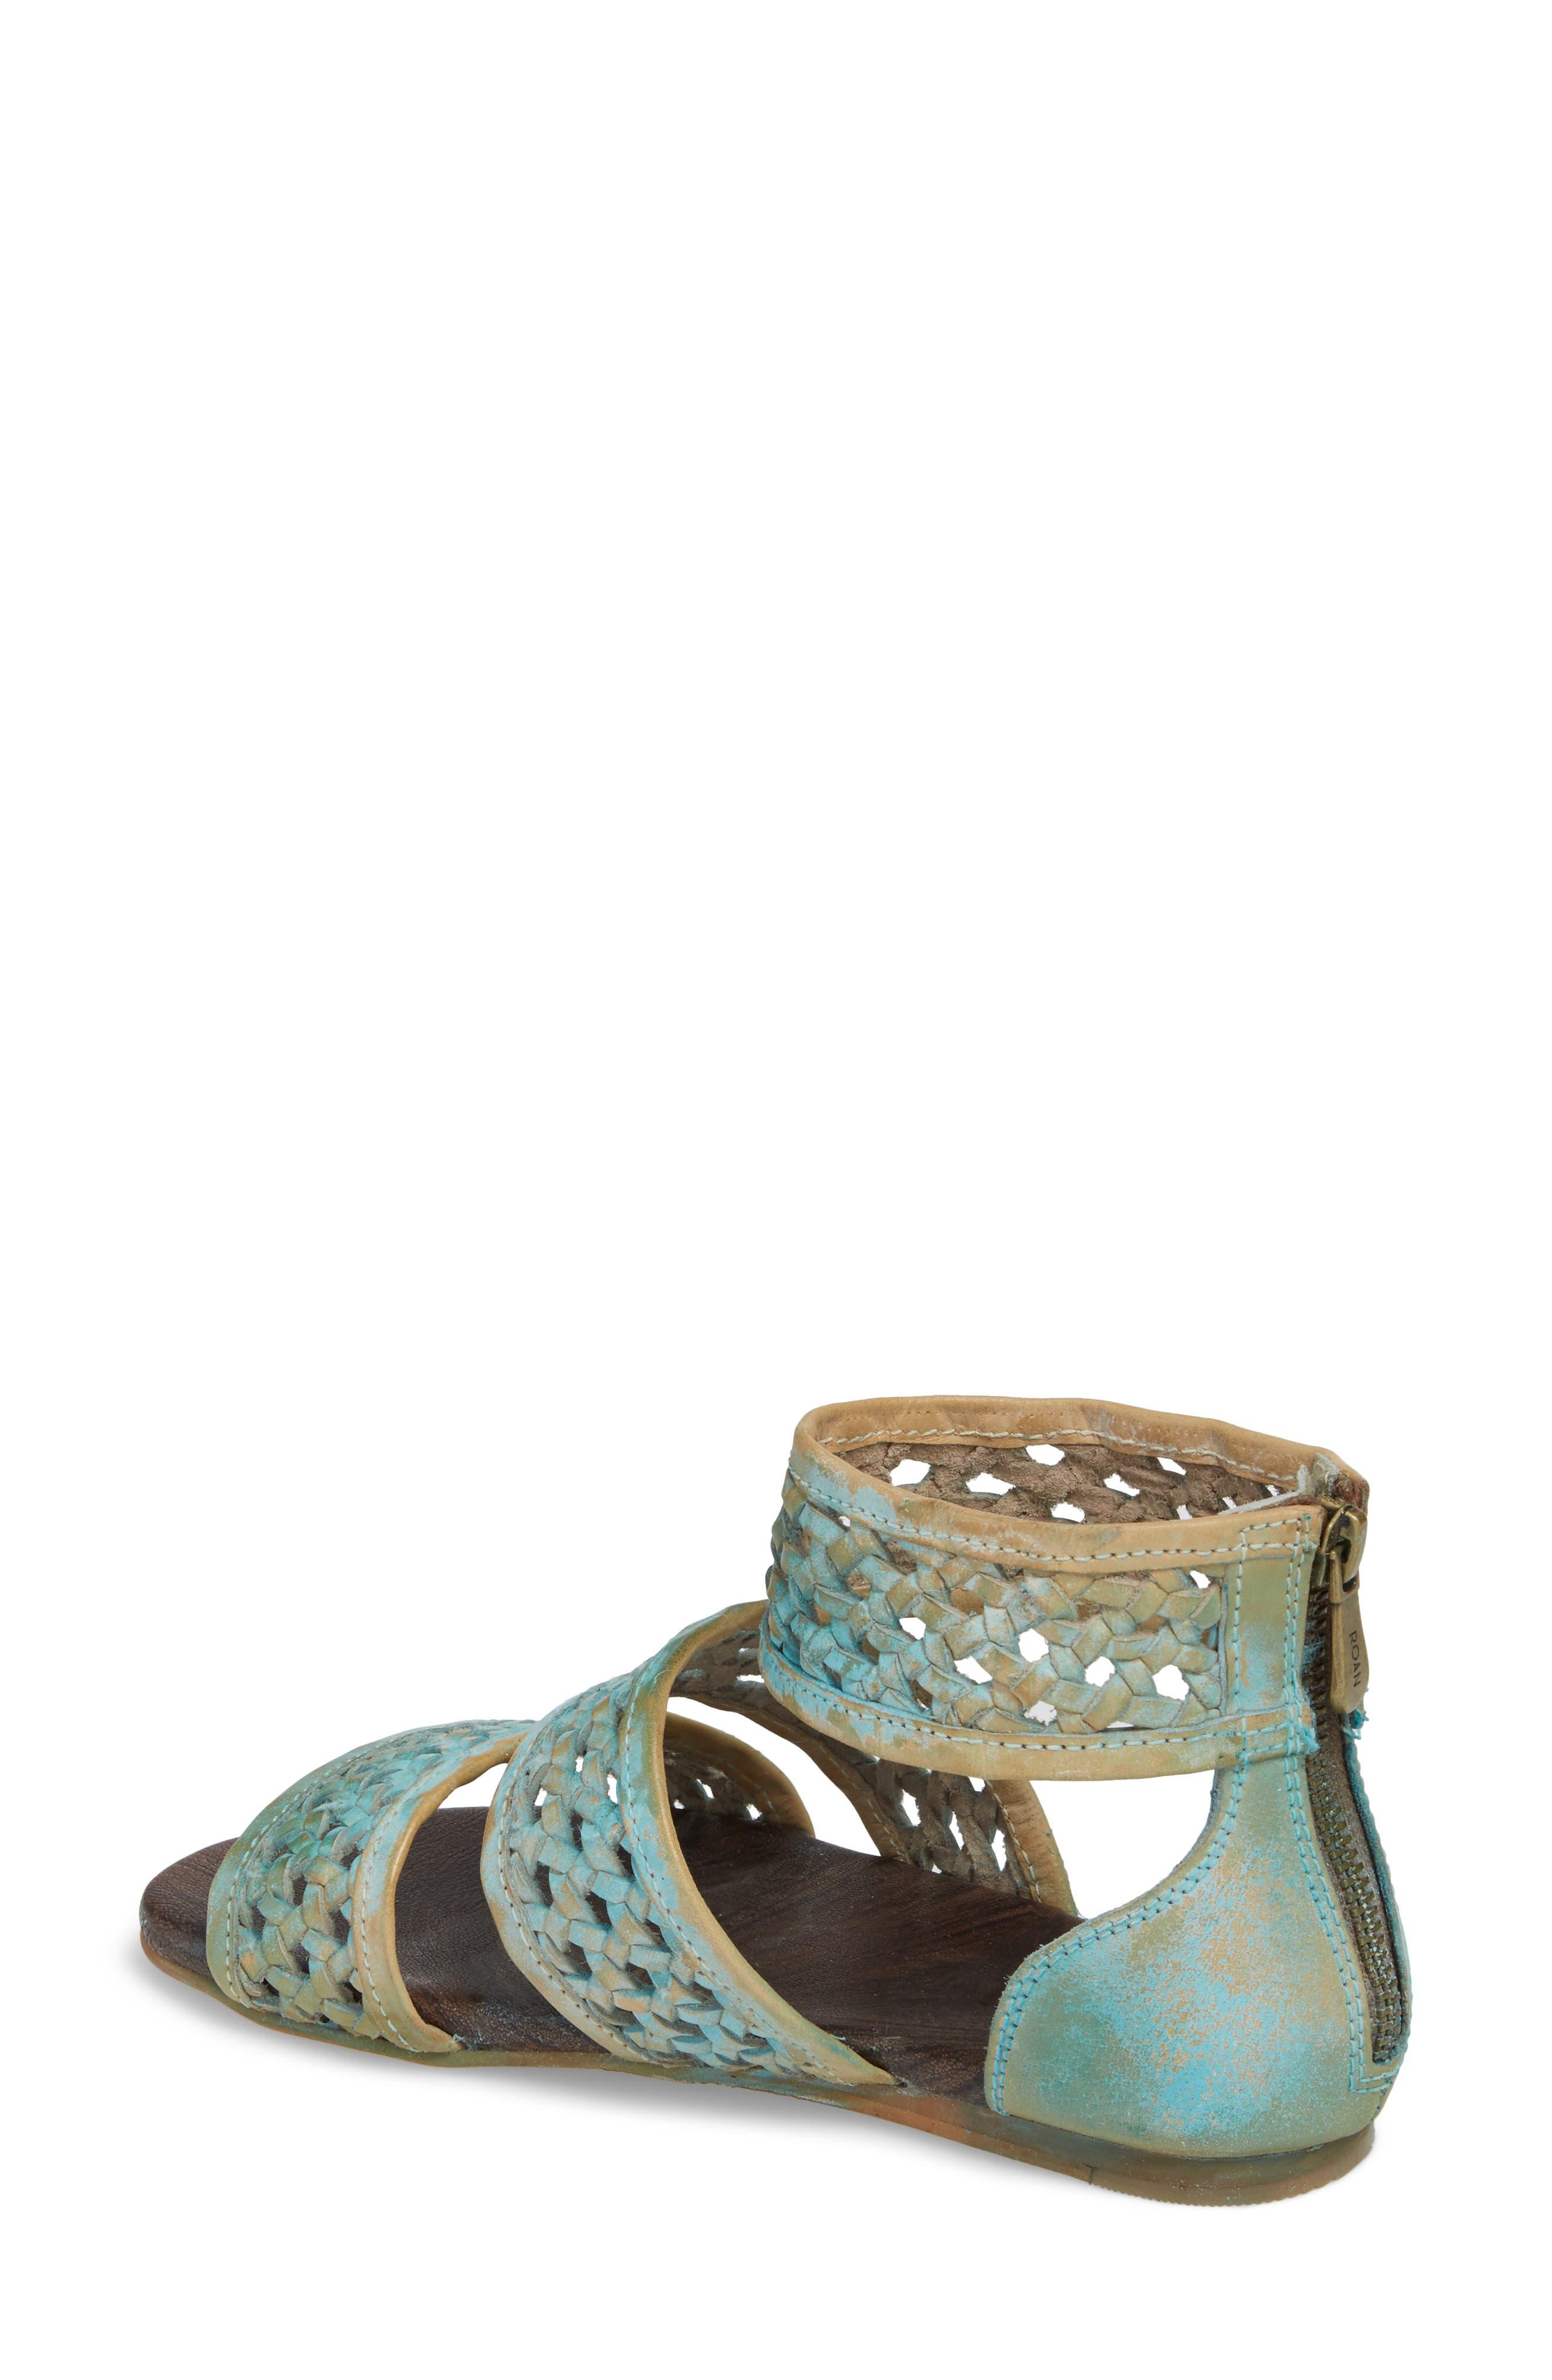 Clio Woven Ankle Cuff Sandal,                             Alternate thumbnail 2, color,                             Blue